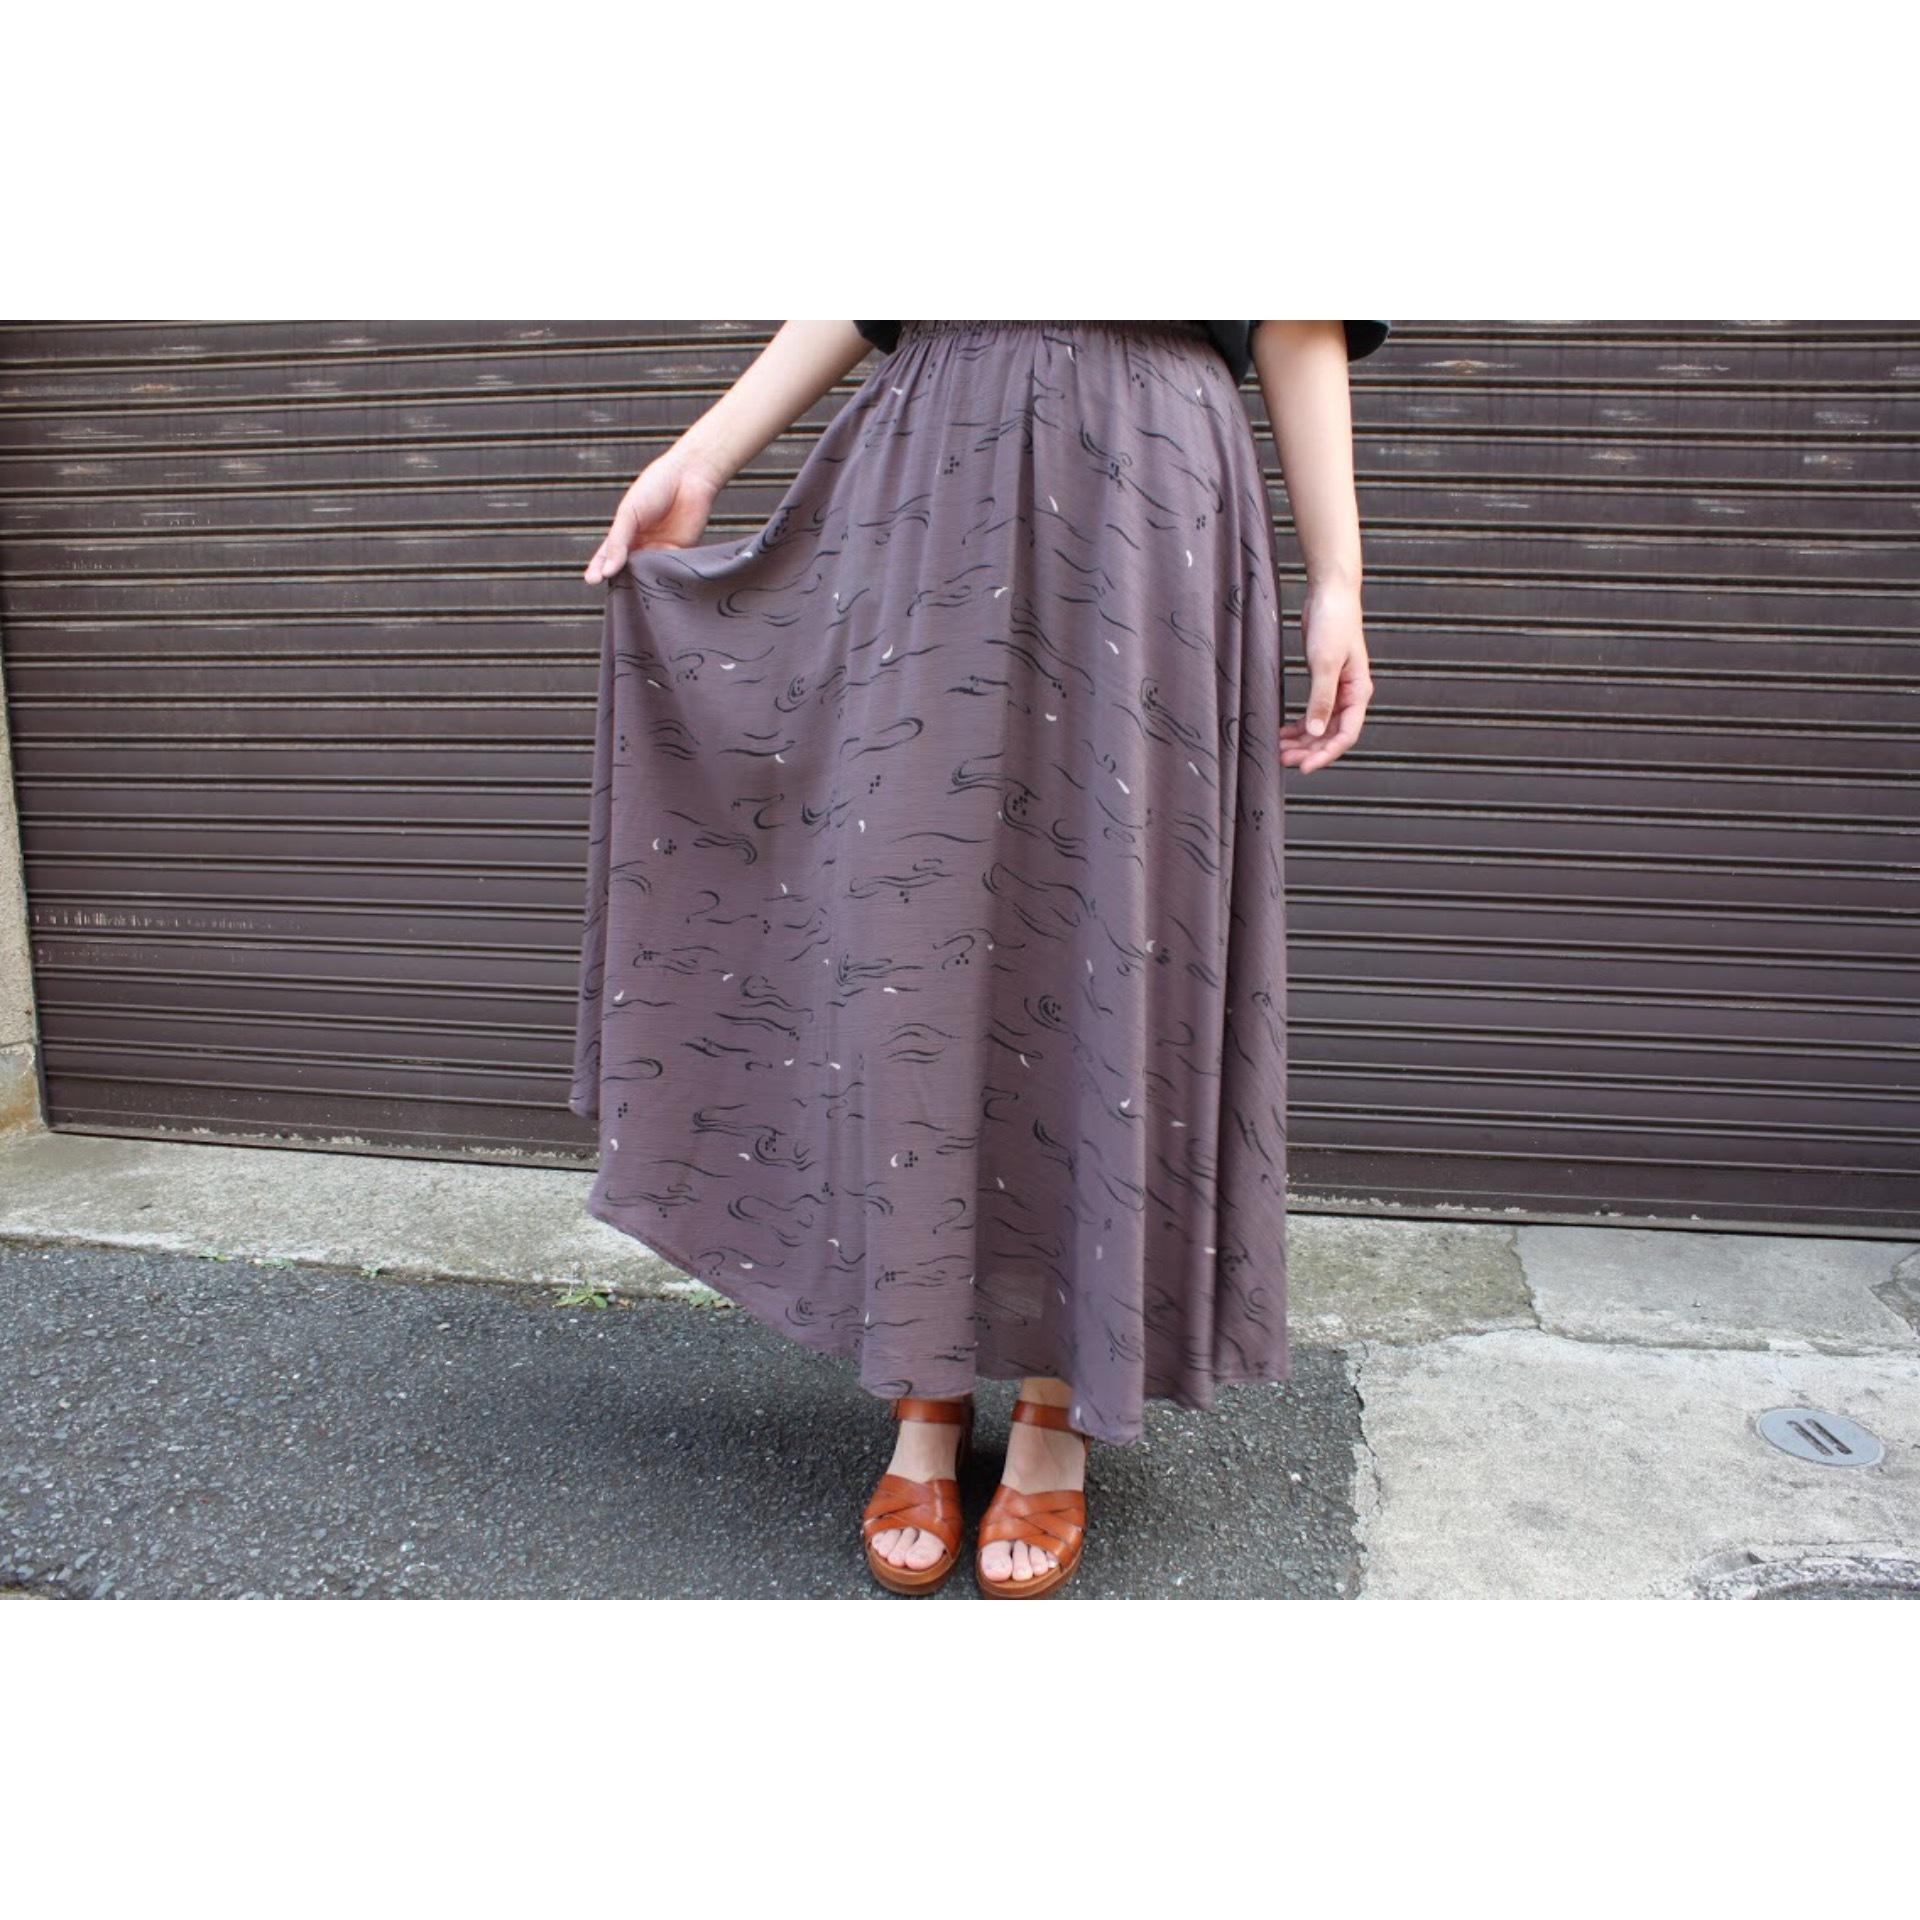 Vintage printed circular skirt